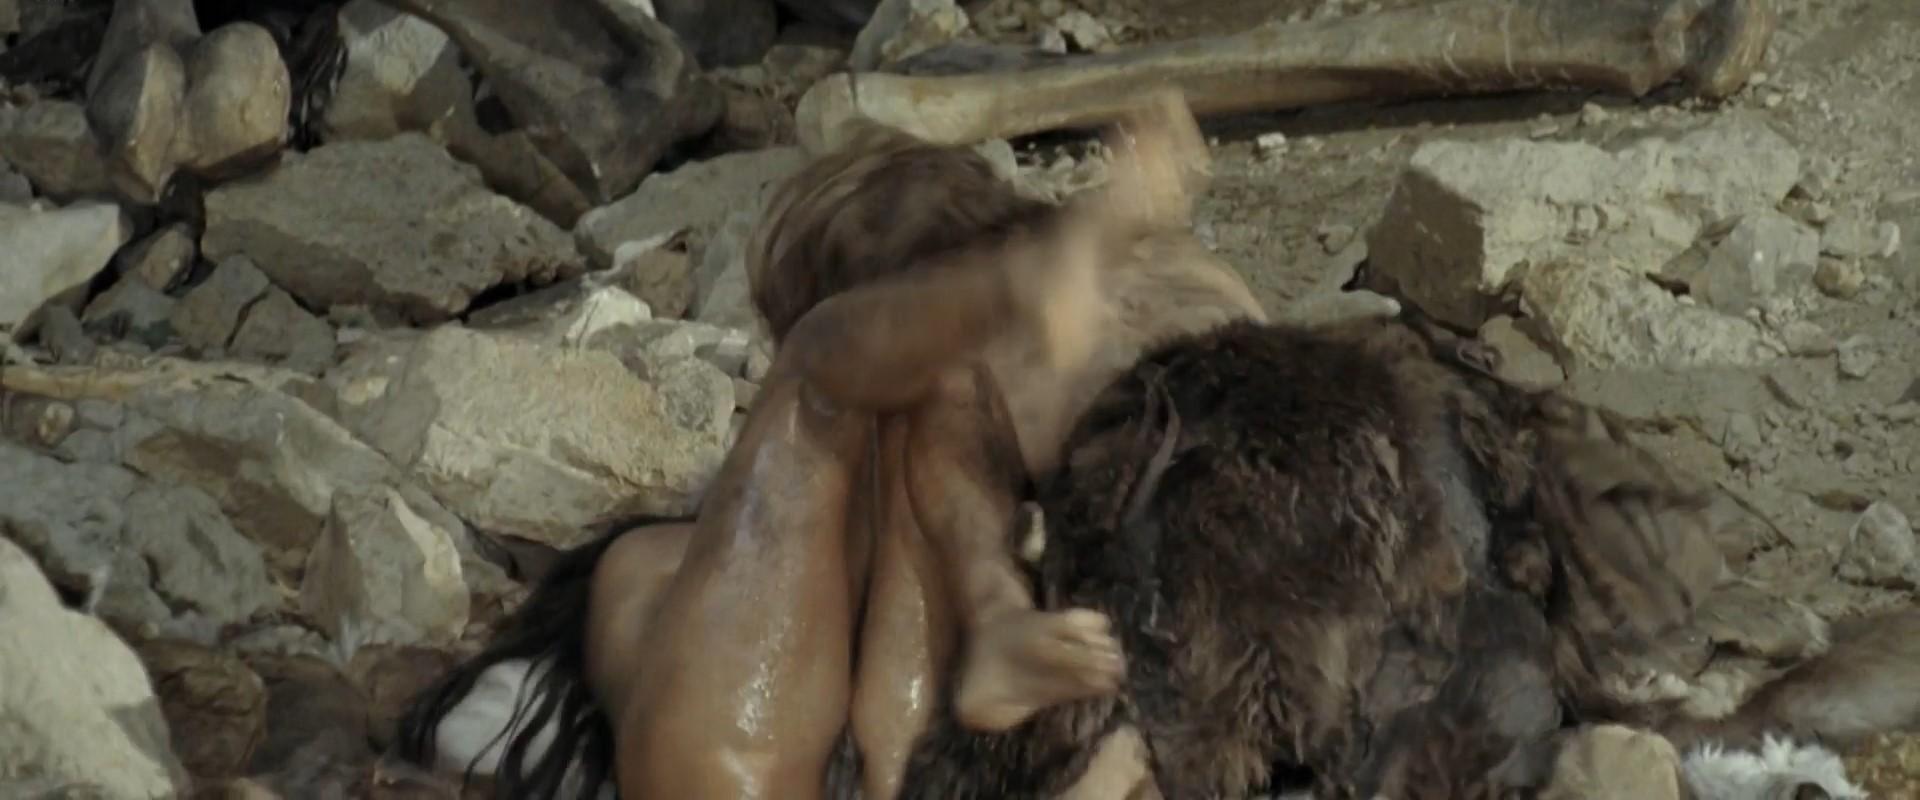 aruna shields nude sex